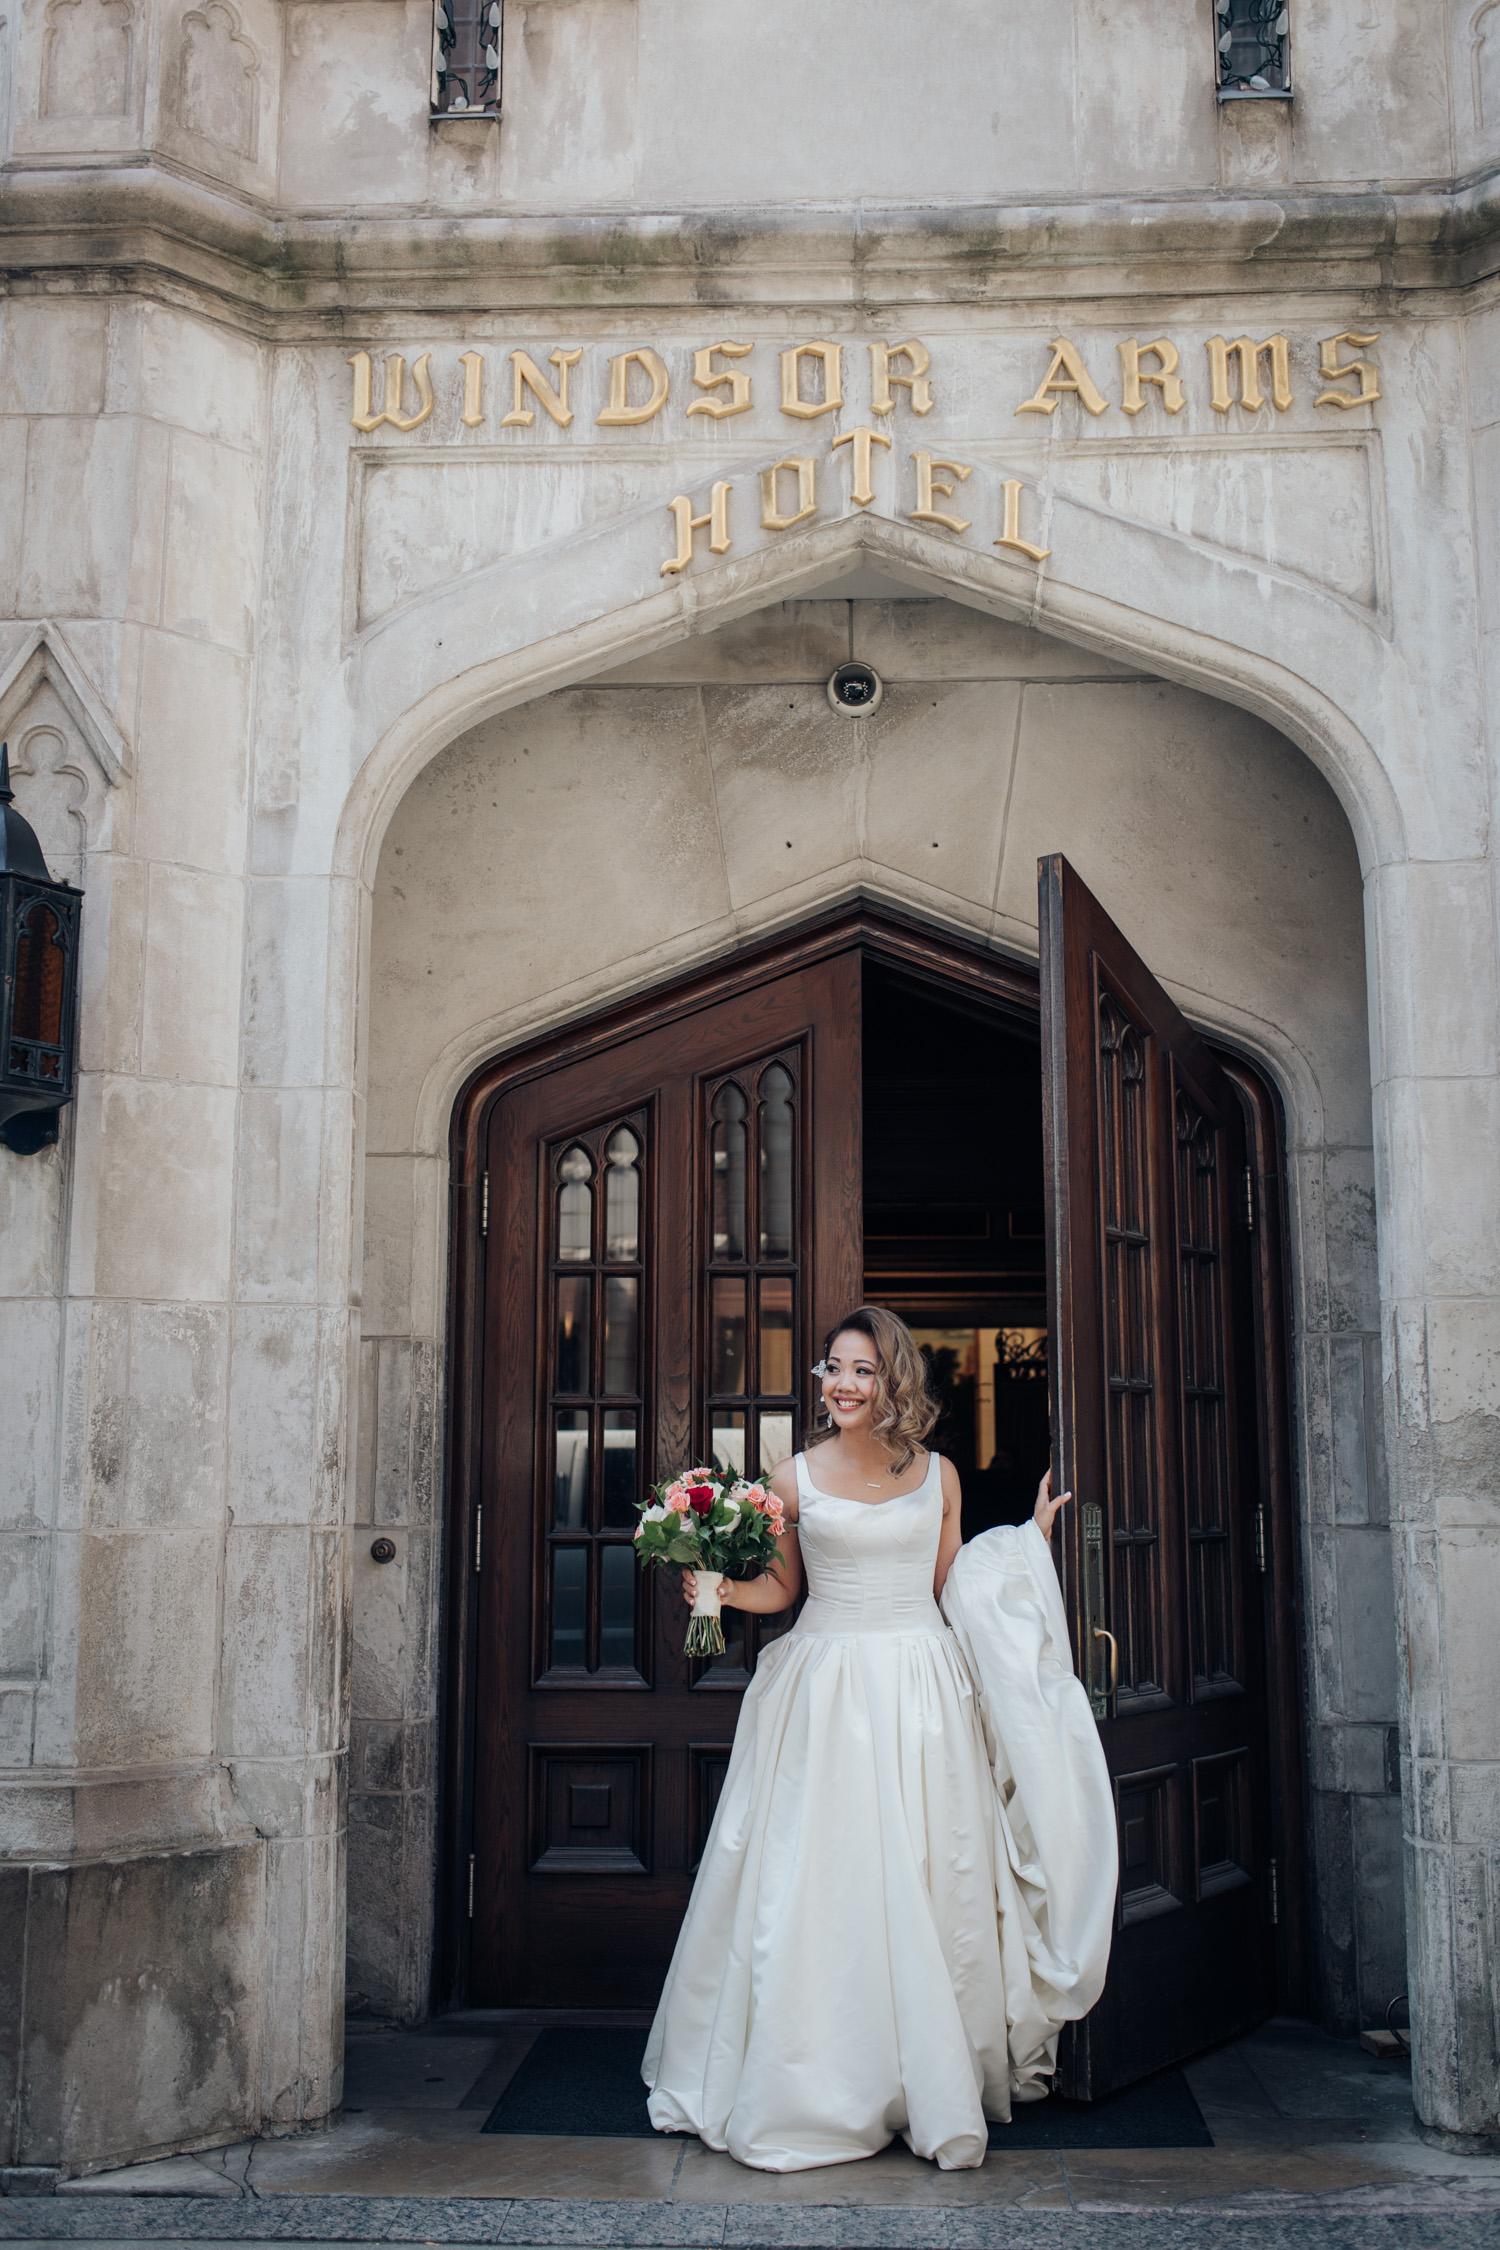 Windor Arms Hotel Wedding Photo